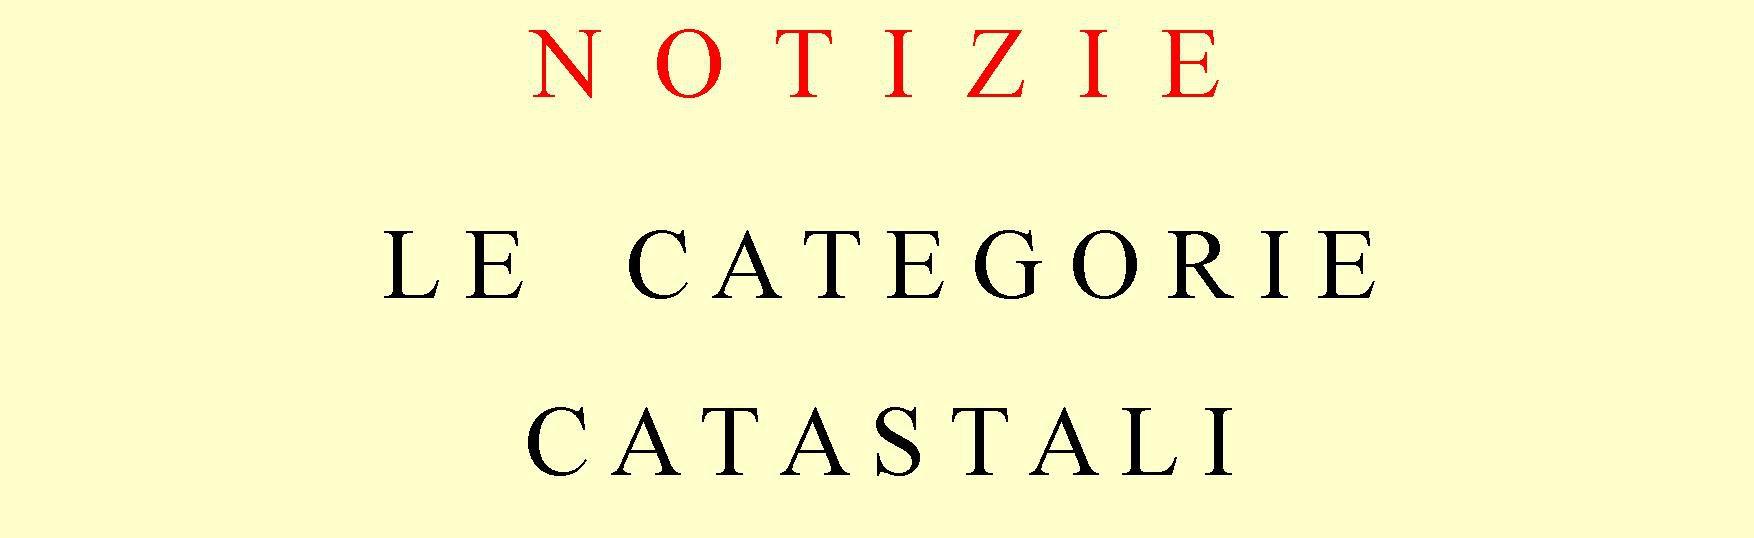 BANNER CATEGORIE CATASTALI